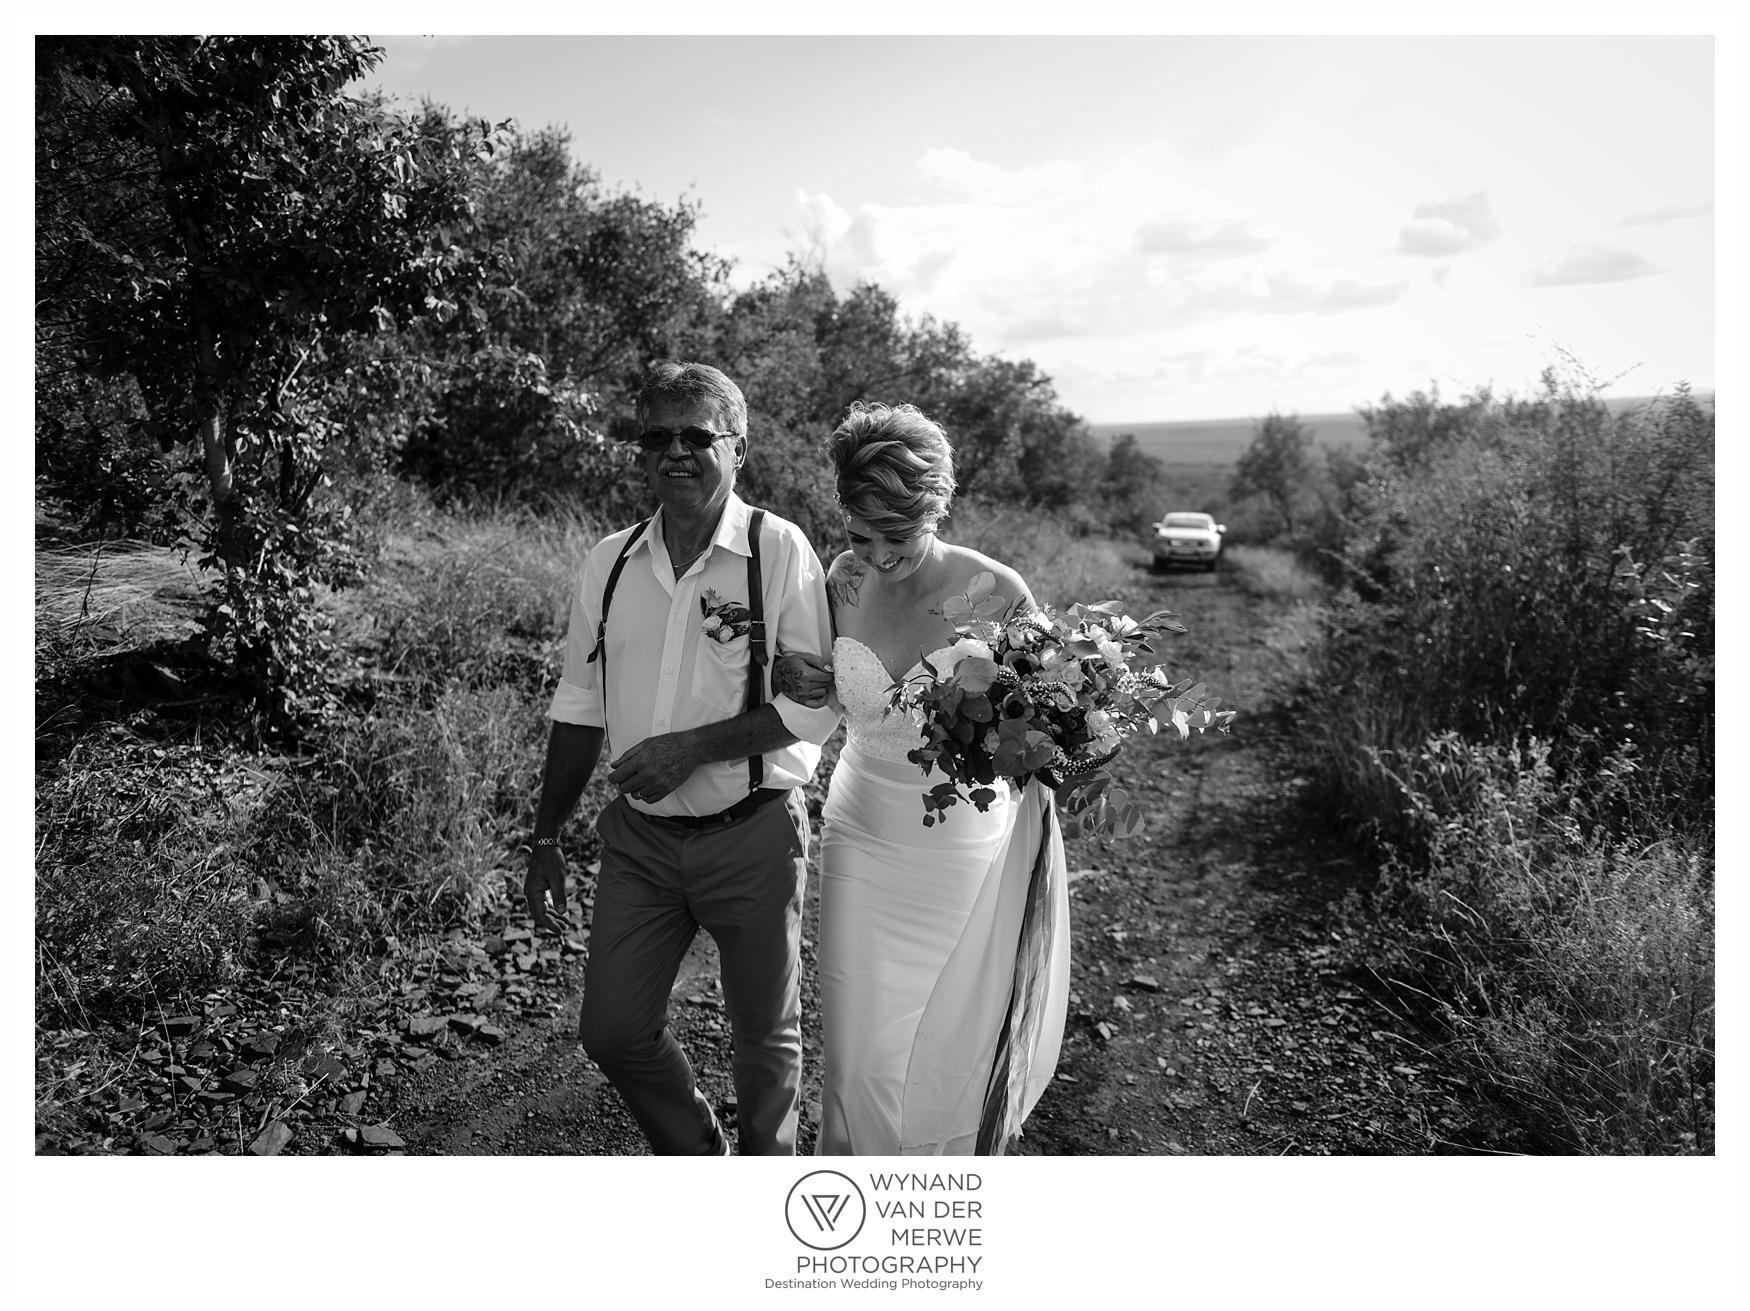 WynandvanderMerwe_weddingphotography_bushveldwedding_northam_bushveld_limpopowedding_limpopo_southafrica-72.jpg